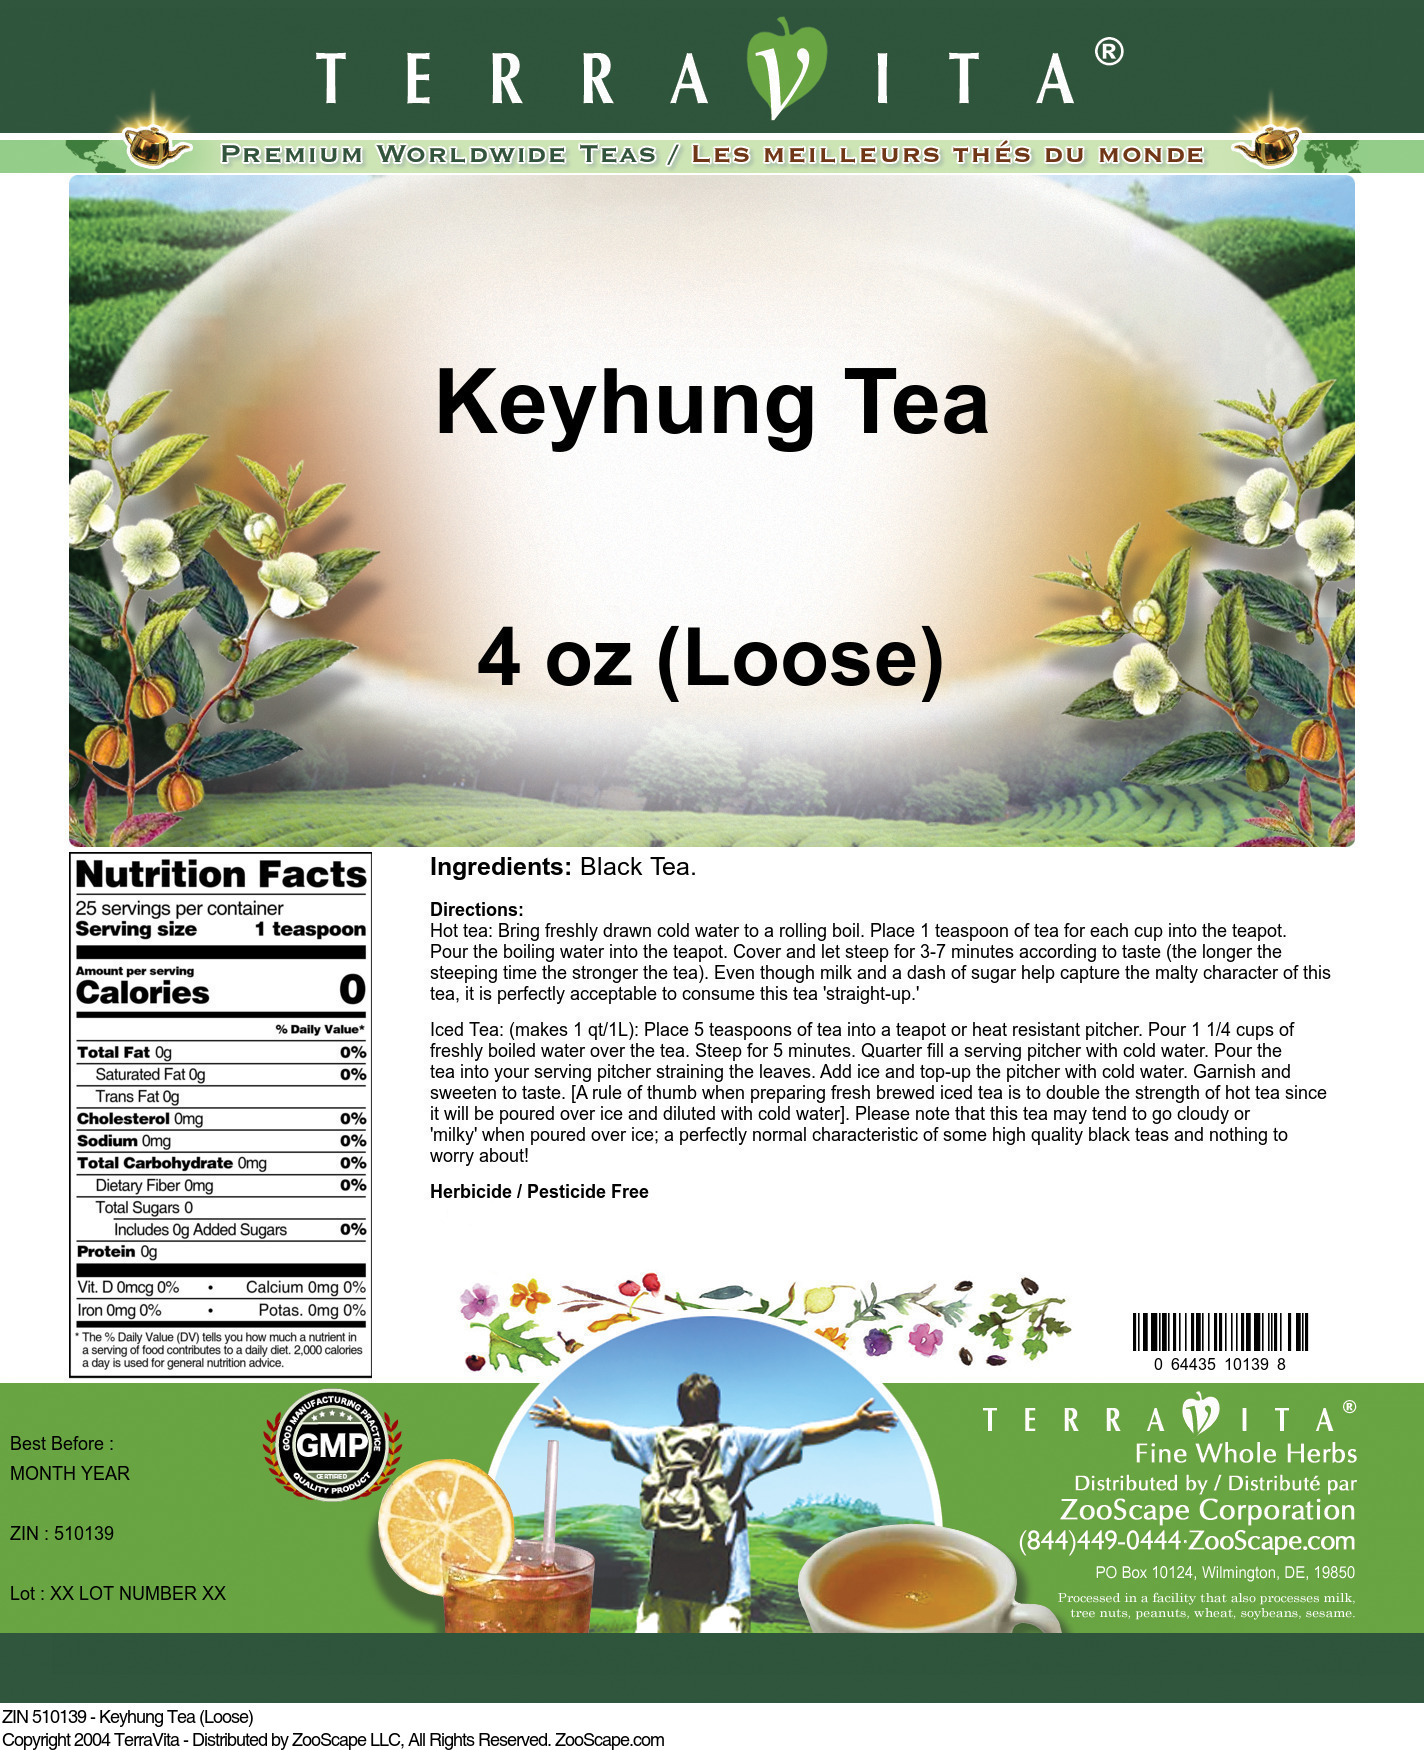 Keyhung Assam 2nd Flush